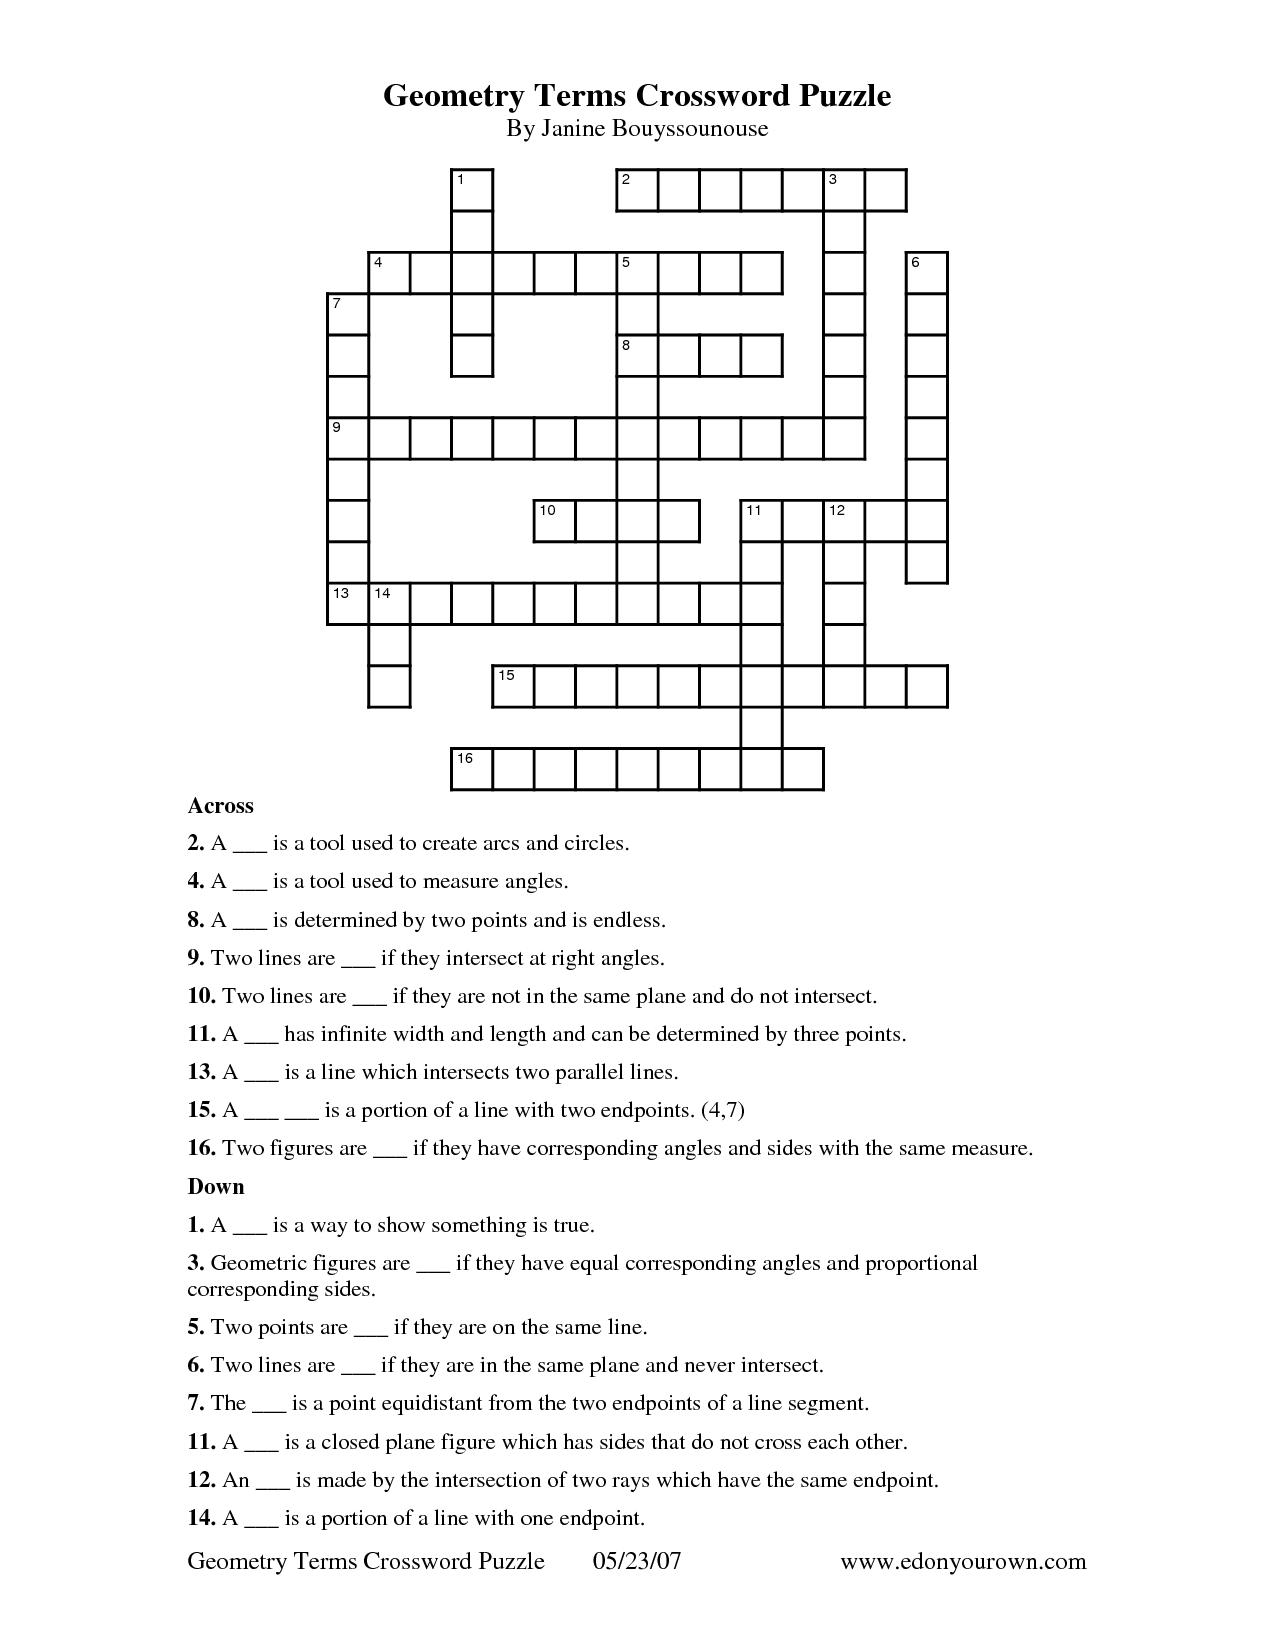 Geometry Terms Crossword Puzzle